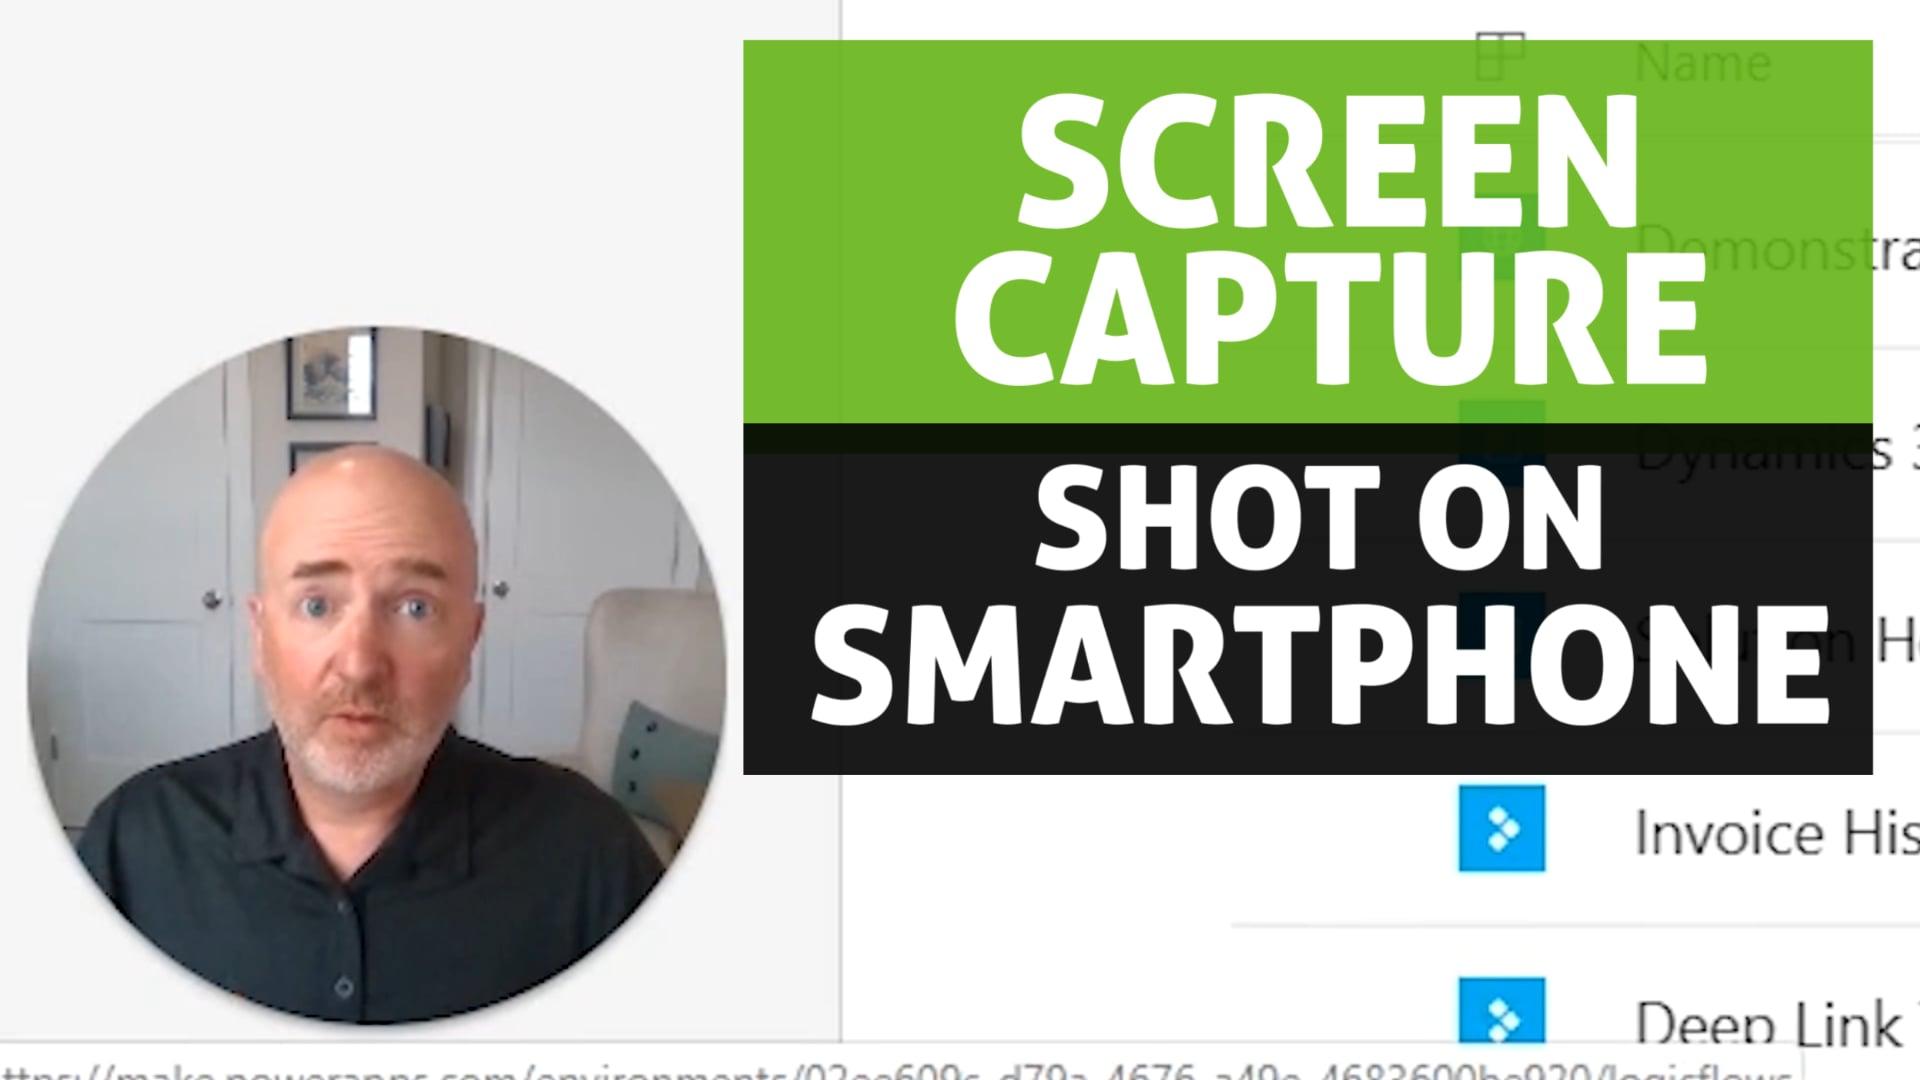 Screen capture with webcam